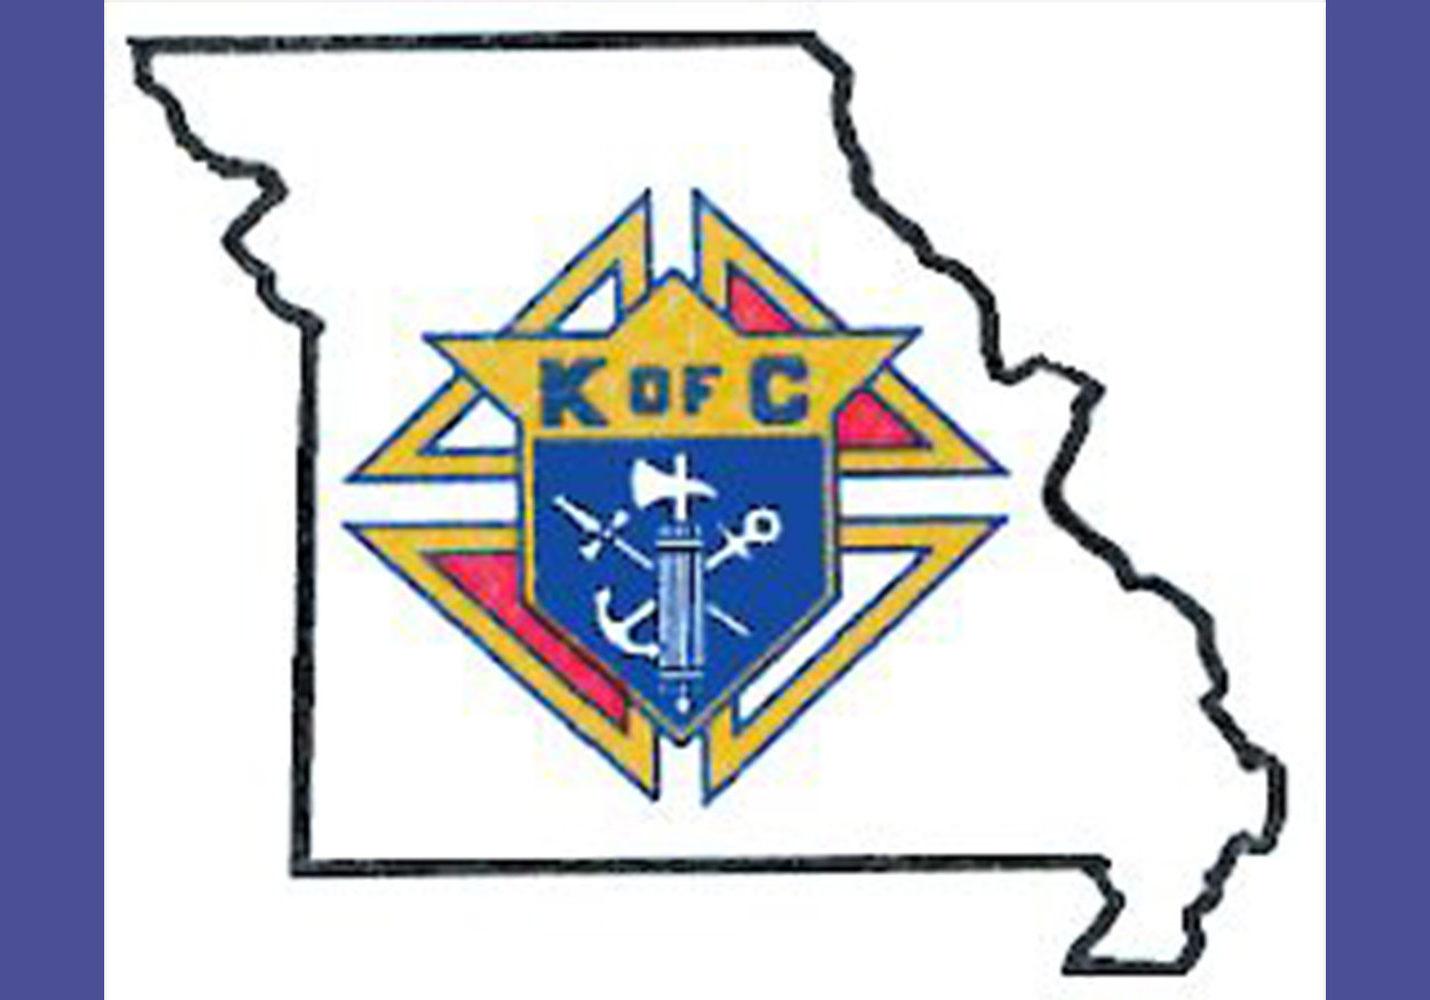 20191030 190152 MissouriKnightstofundlocalevangelizationprogramsthroughrevampedR.I.B.program